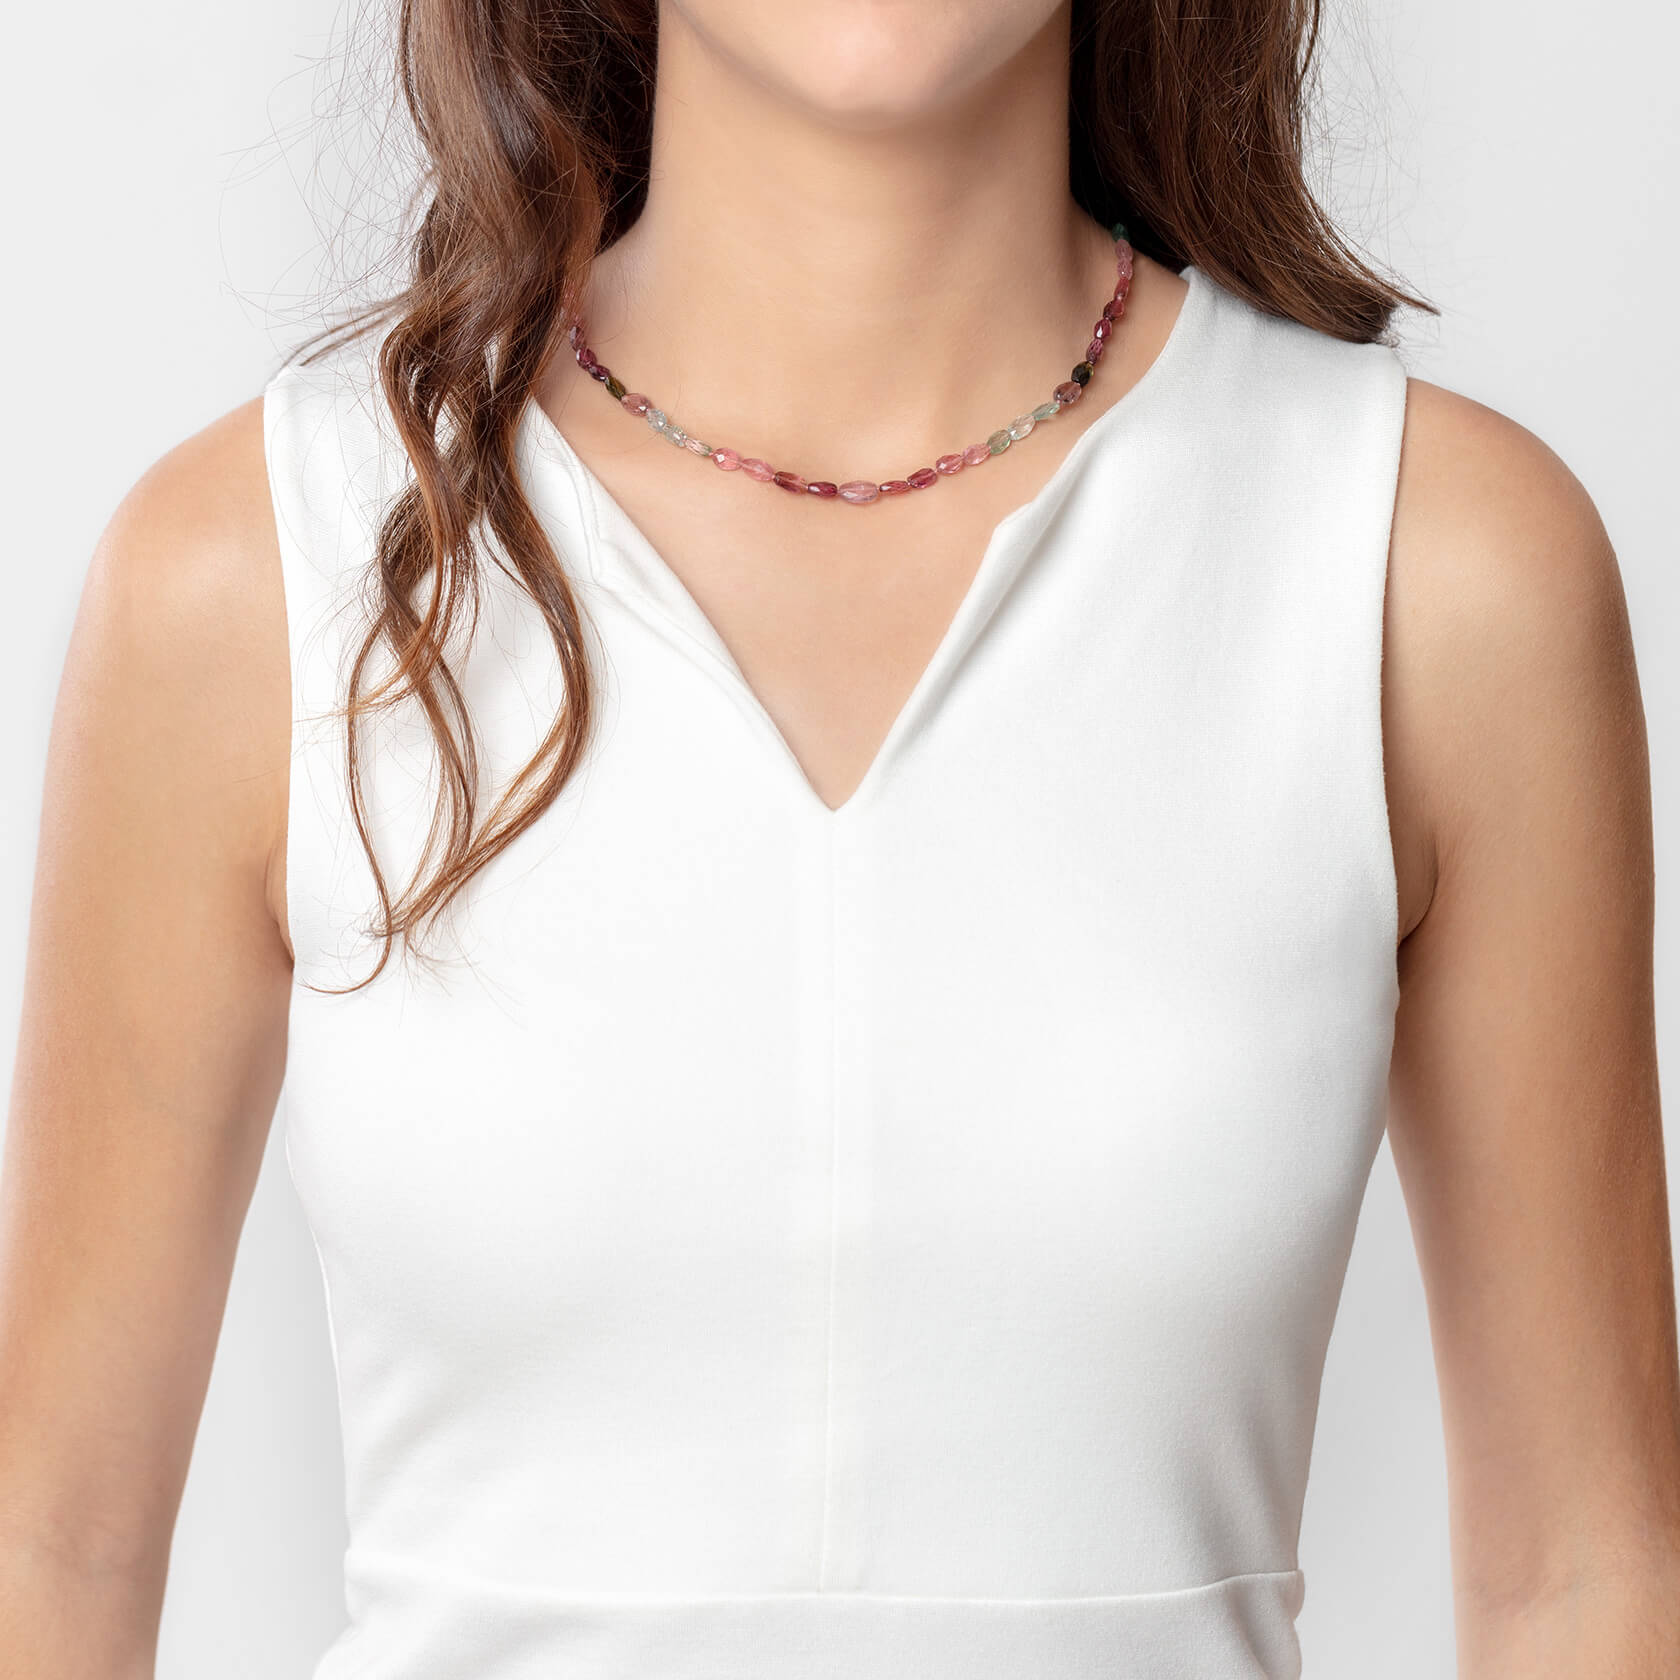 Rose tourmaline esenciales necklace